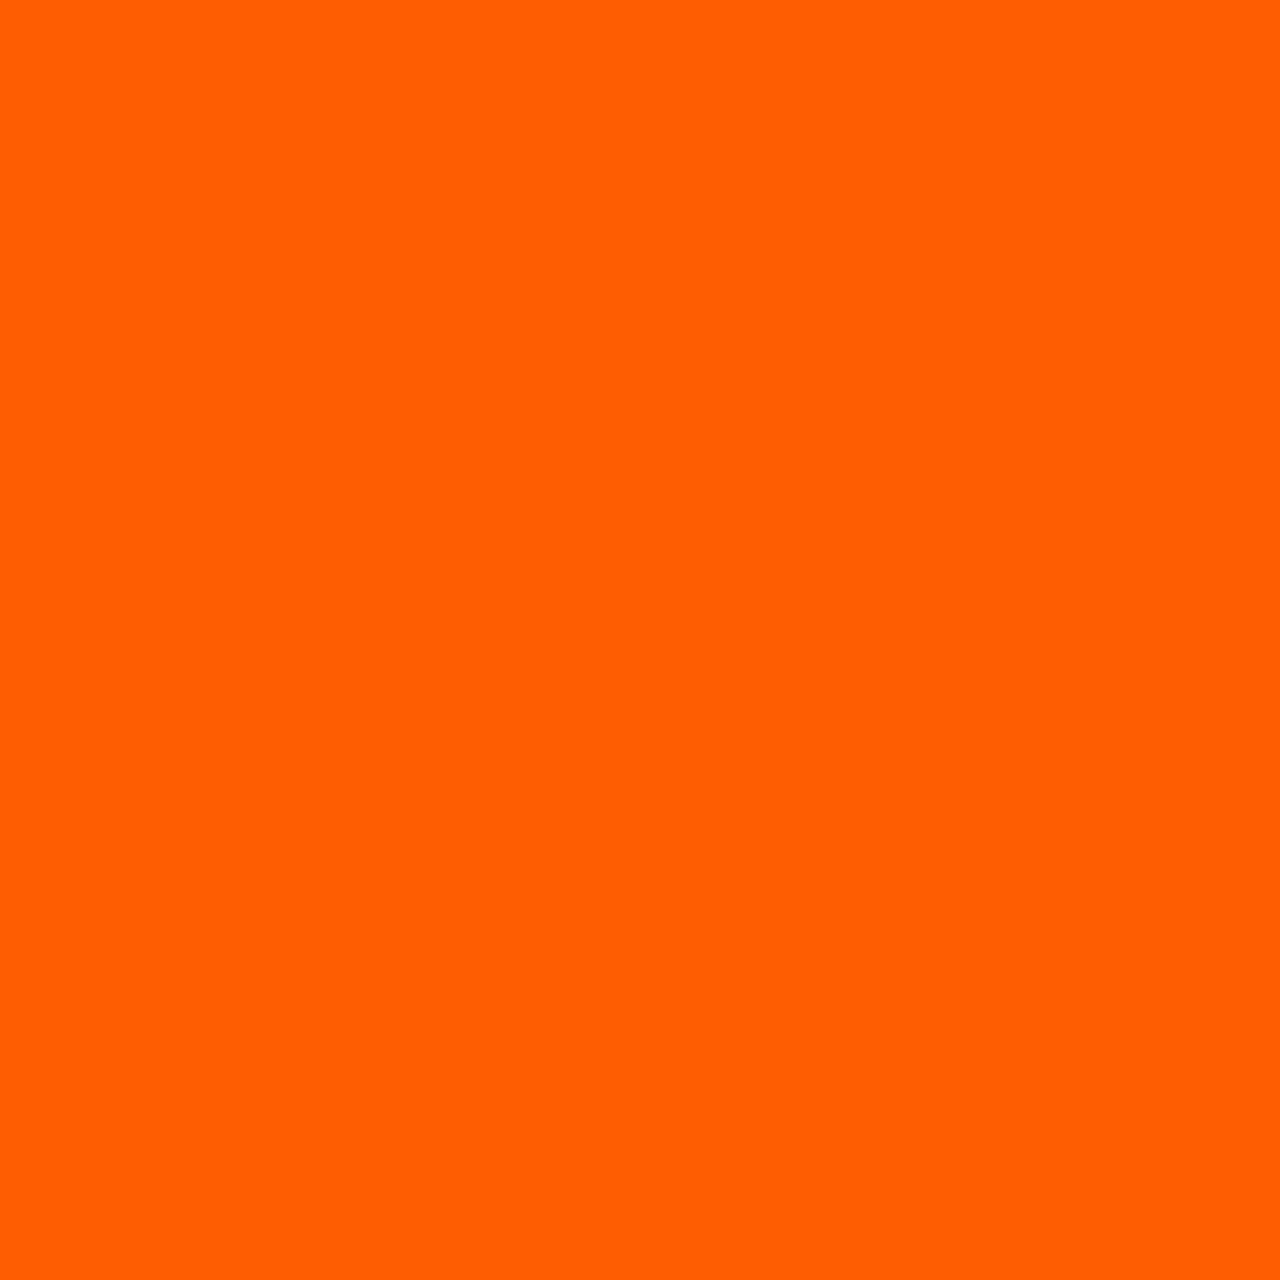 "#0023 Rosco Gels Roscolux Orange, 20x24"""